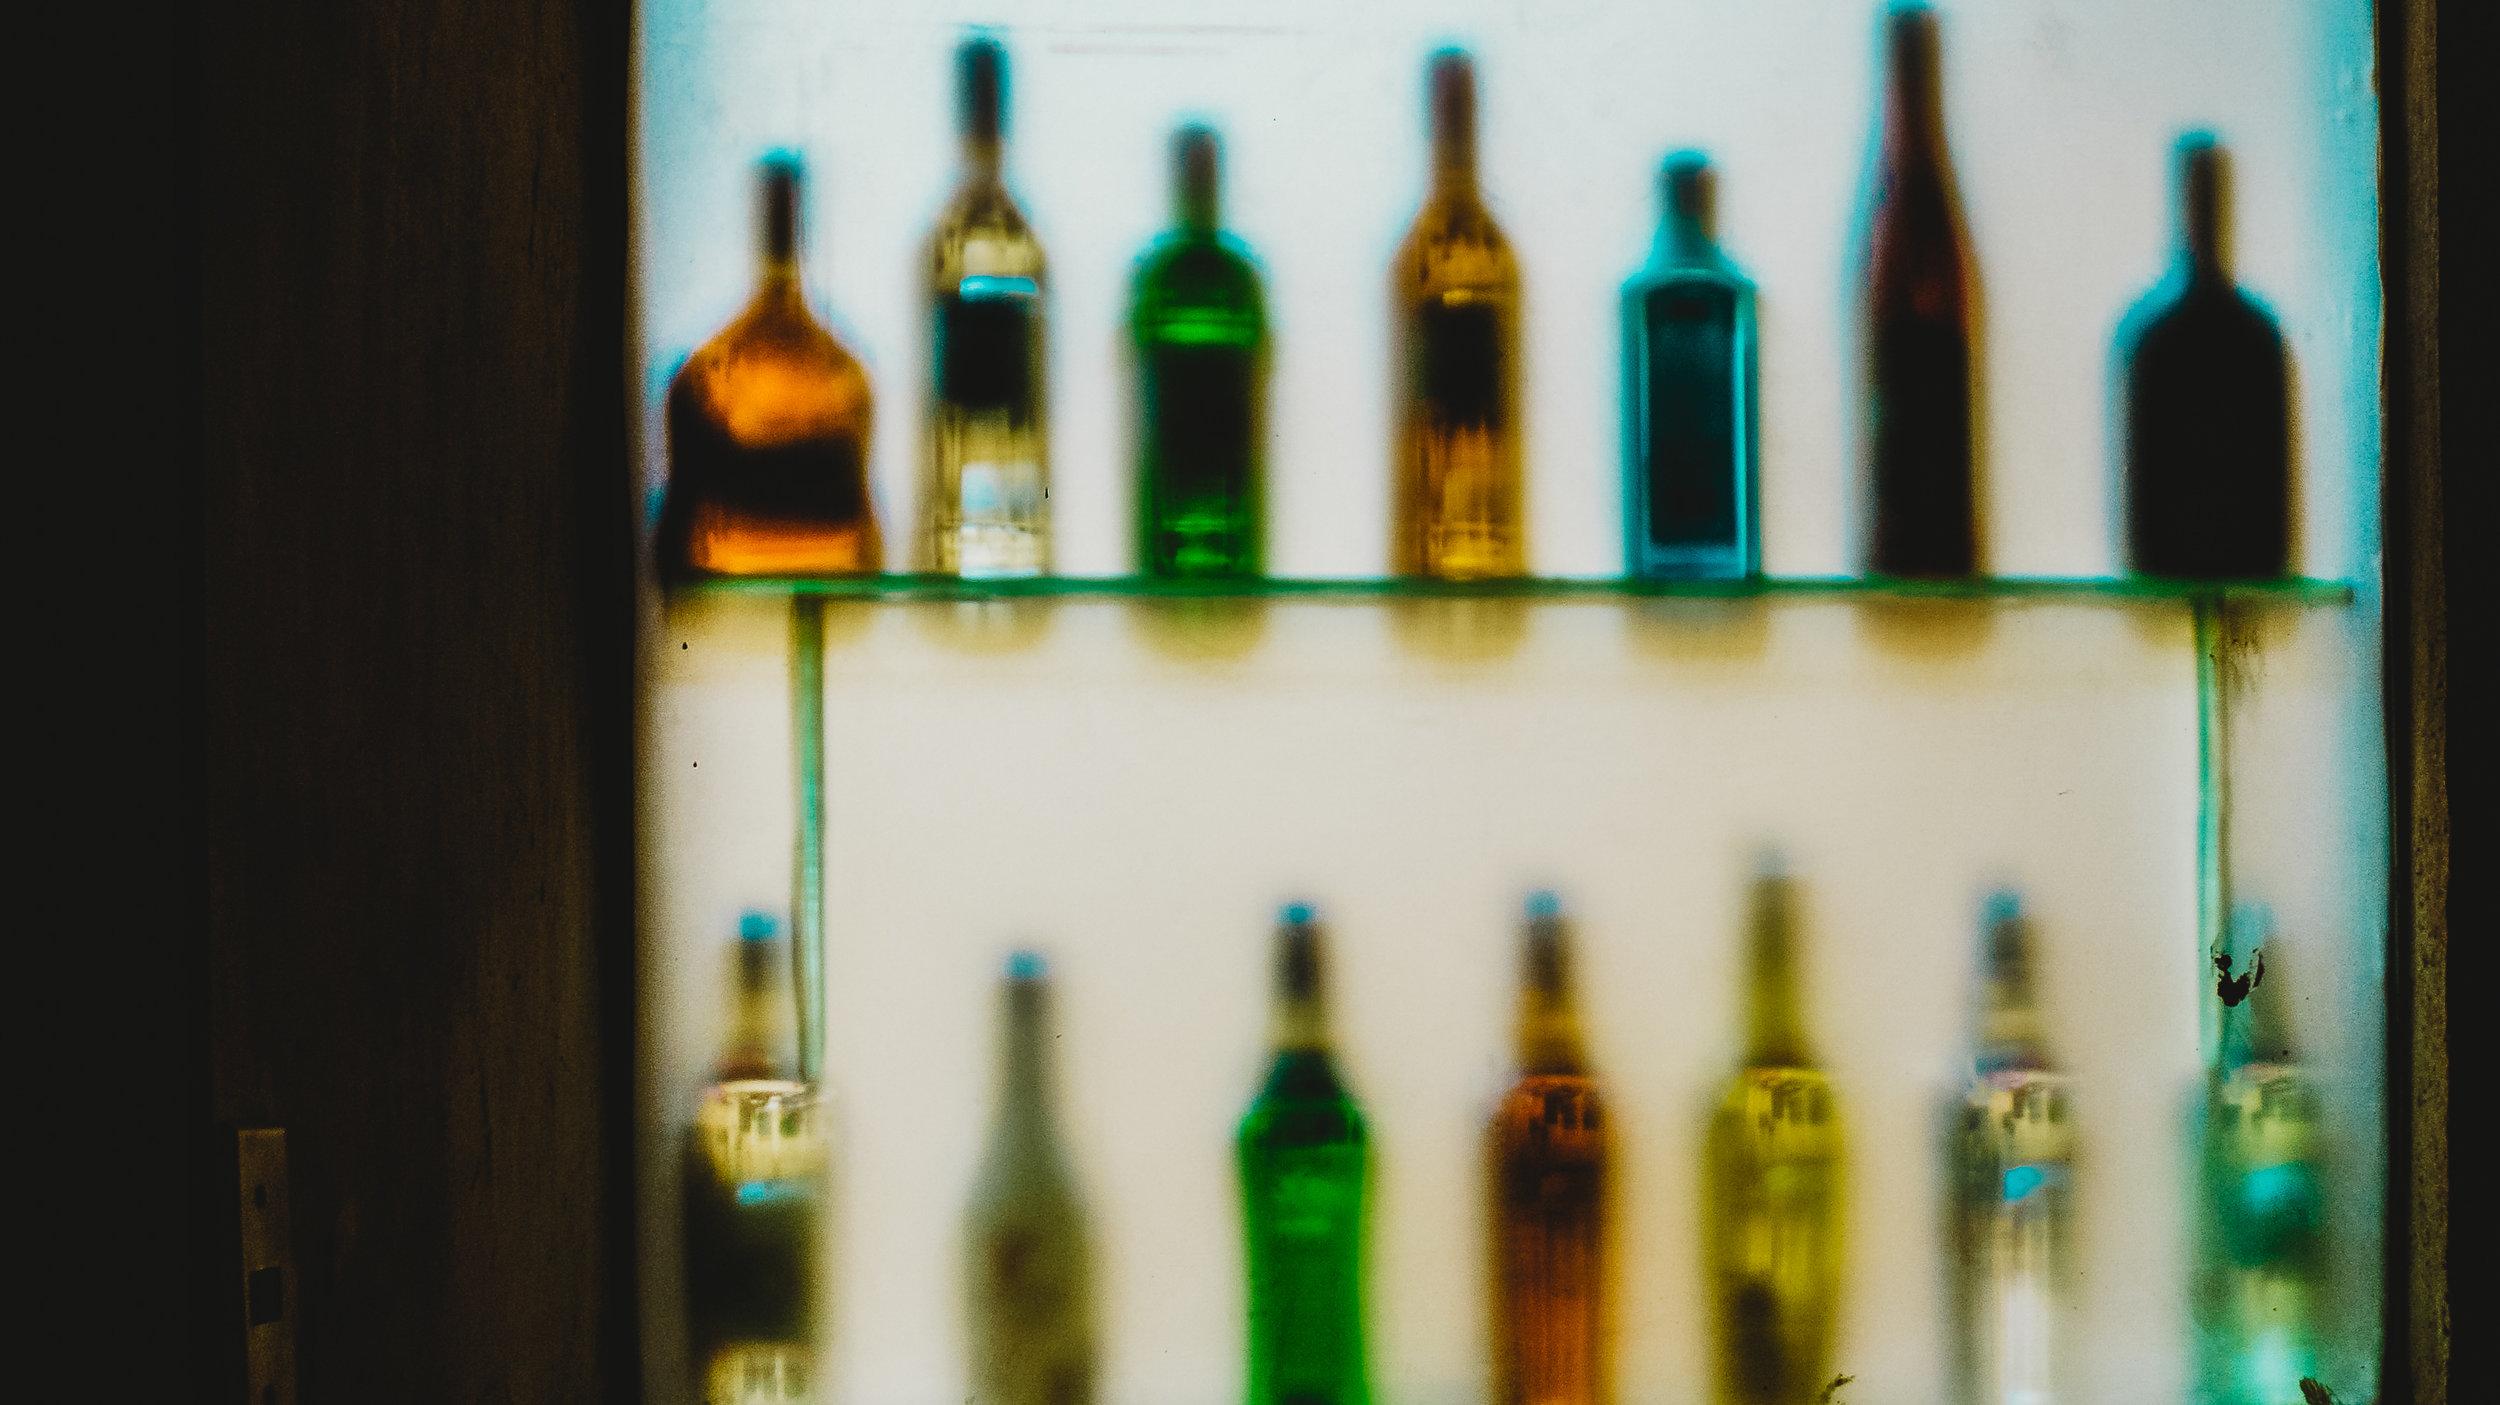 2019 Legislative Changes for California Alcohol Producers